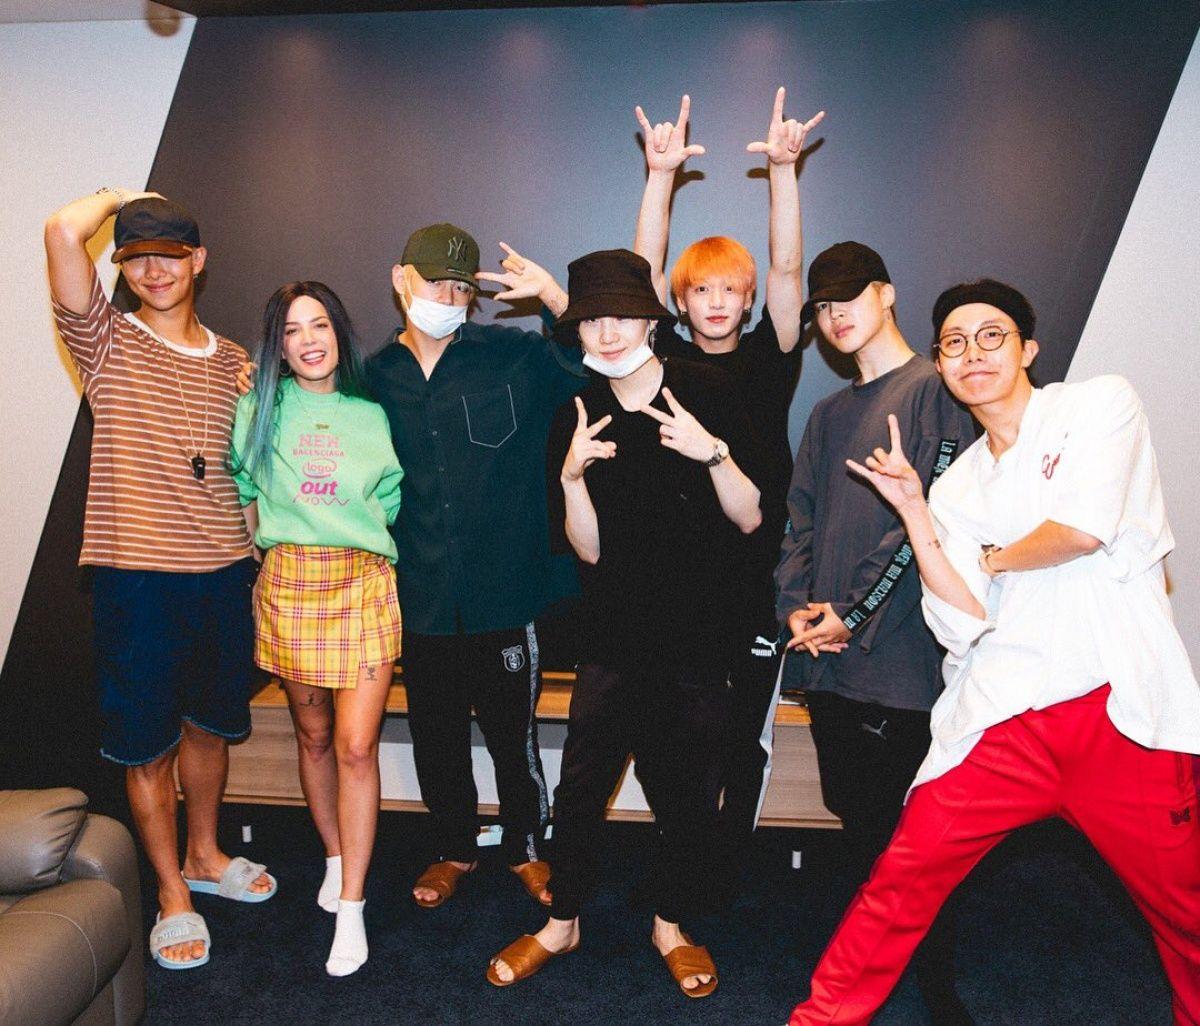 Halsey Meets Up With Bts Backstage In South Korea Halsey Bts Boys Bangtan